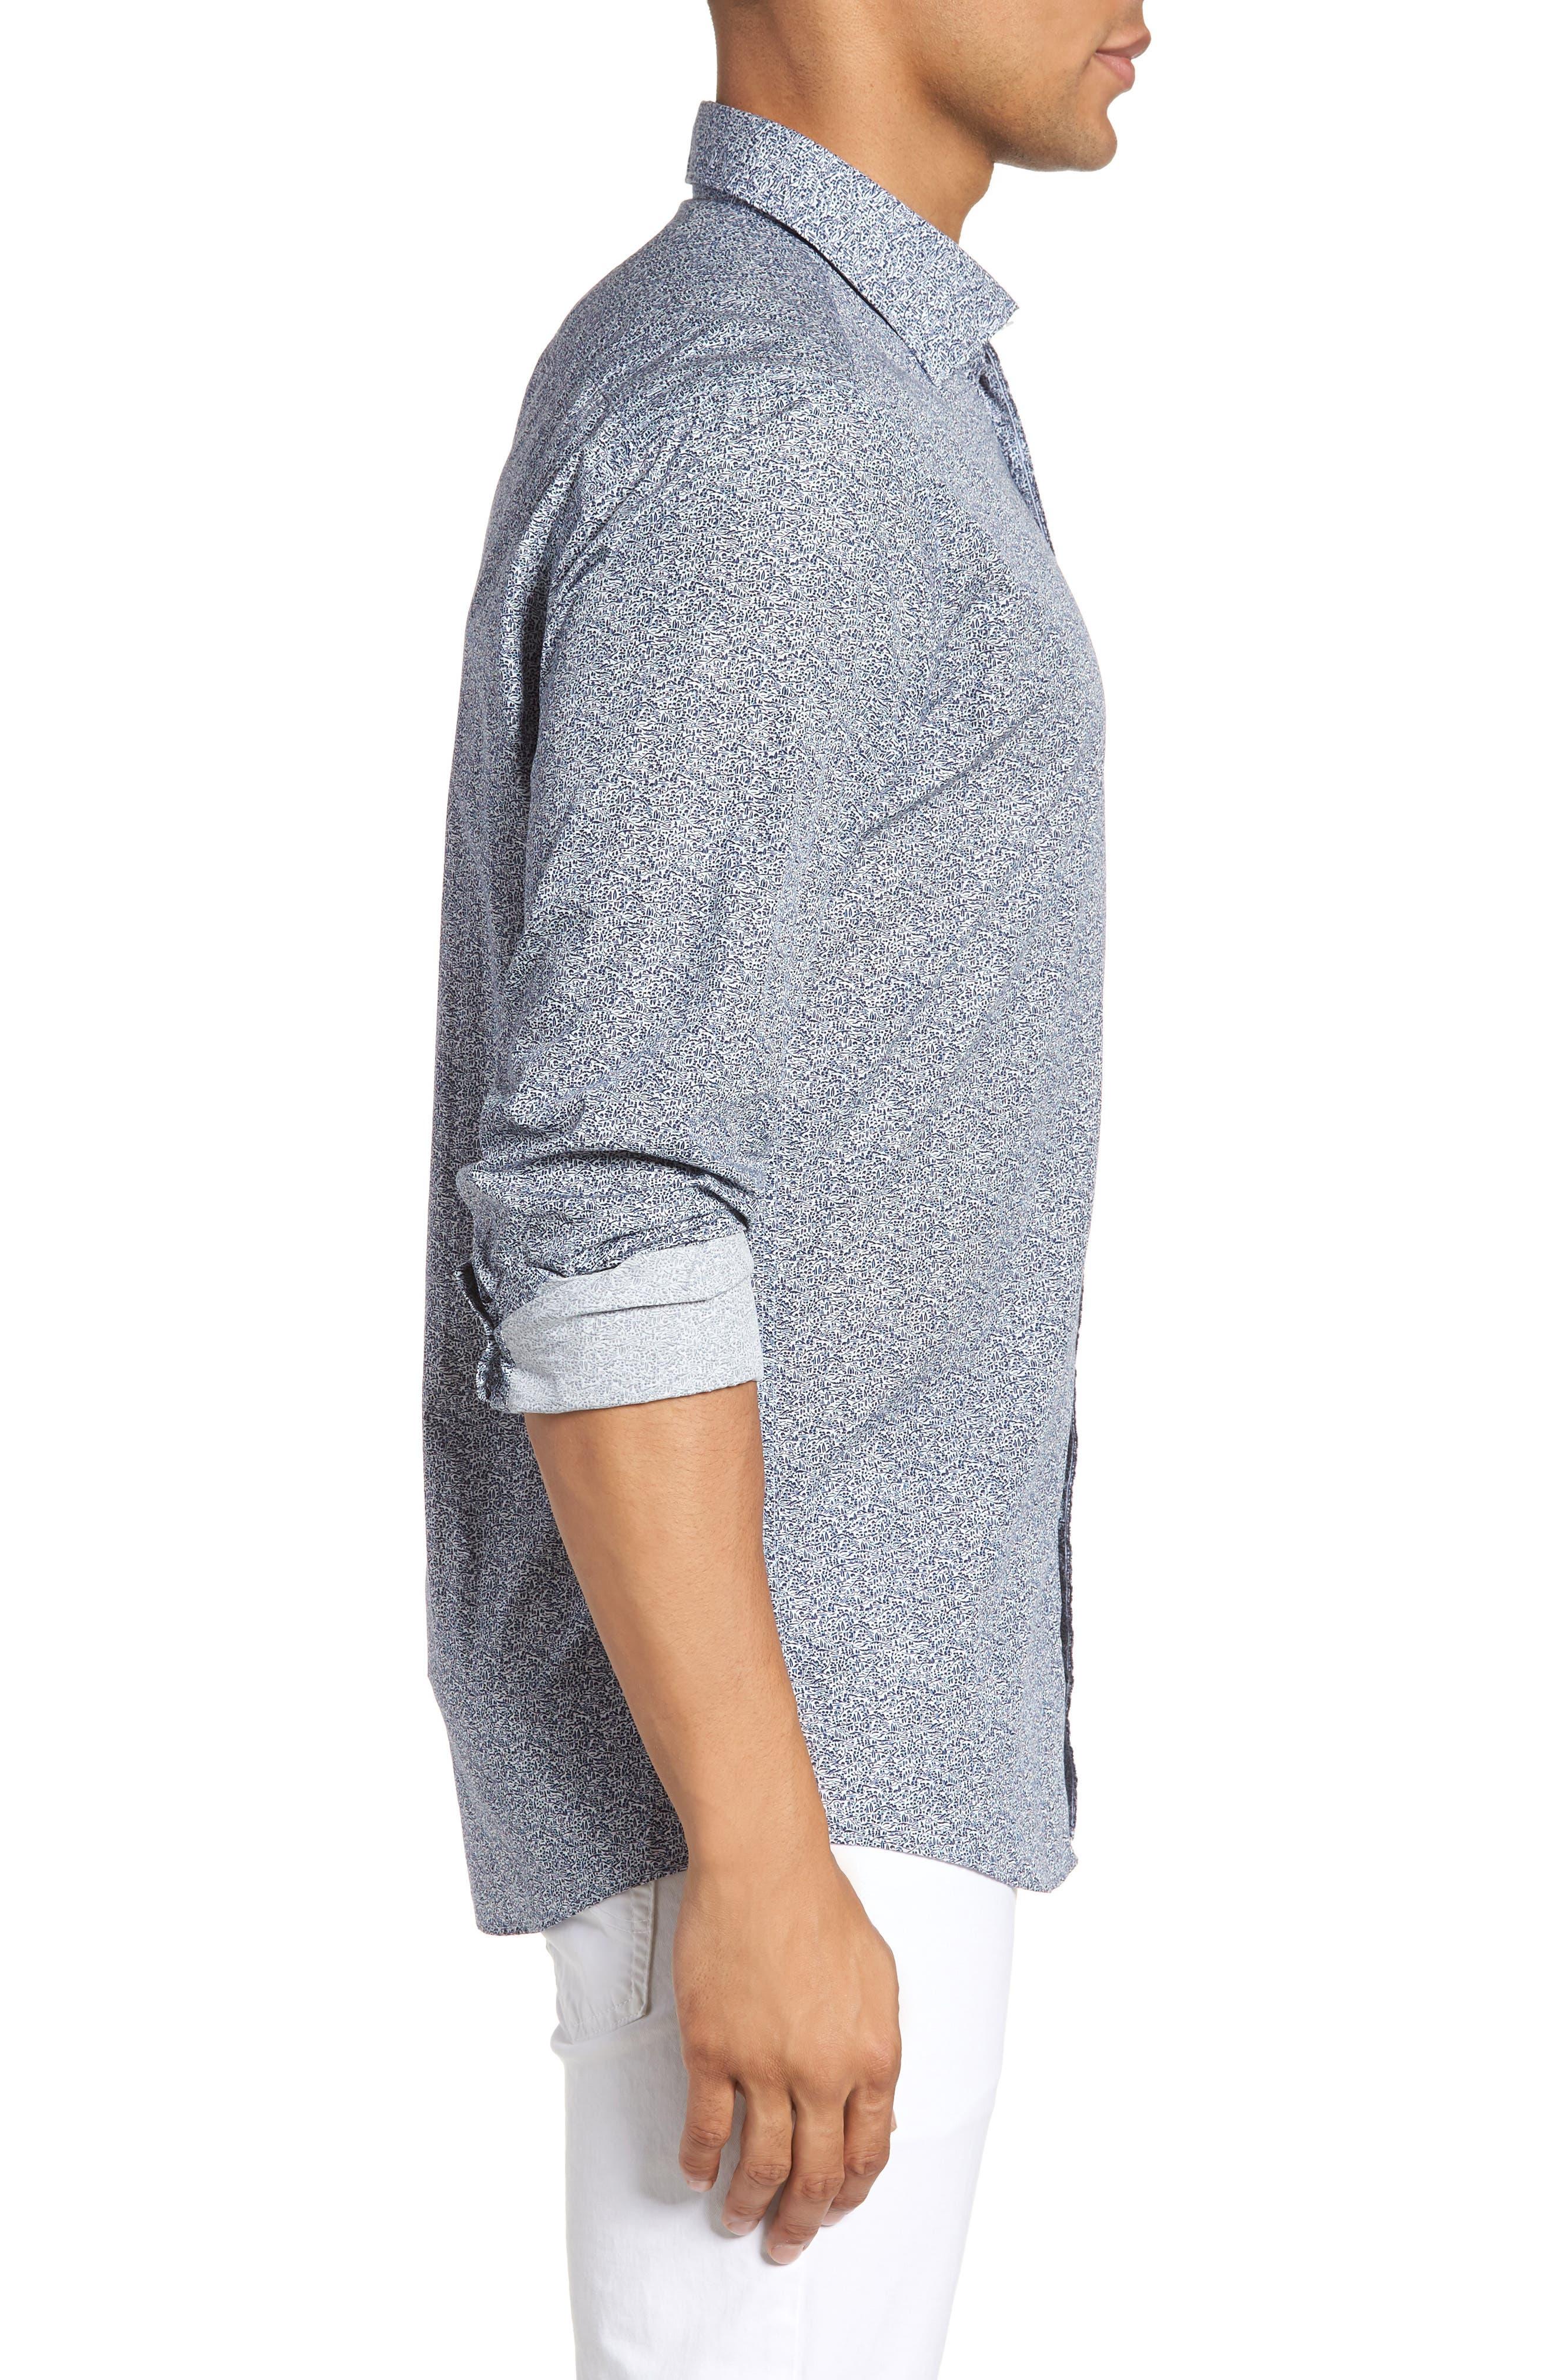 Massey West Slim Fit Sport Shirt,                             Alternate thumbnail 4, color,                             Ink